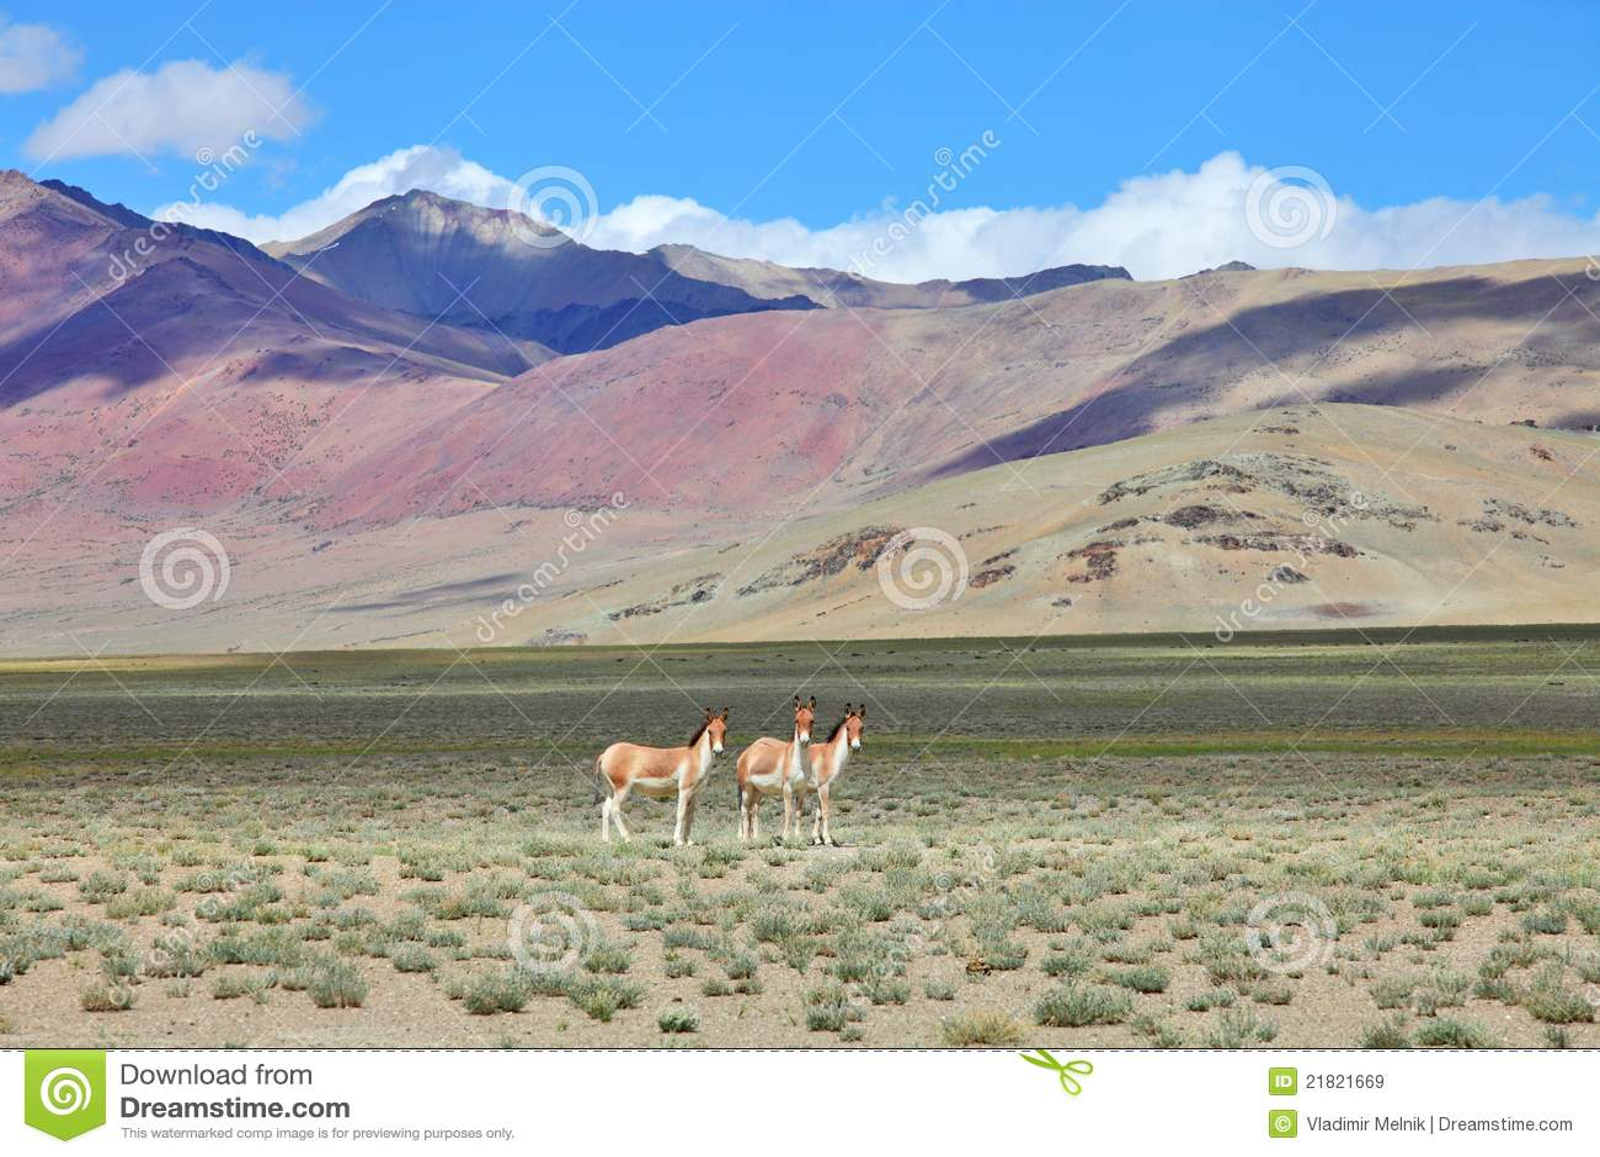 Kiang (Equus kiang)- Tibetan Wild